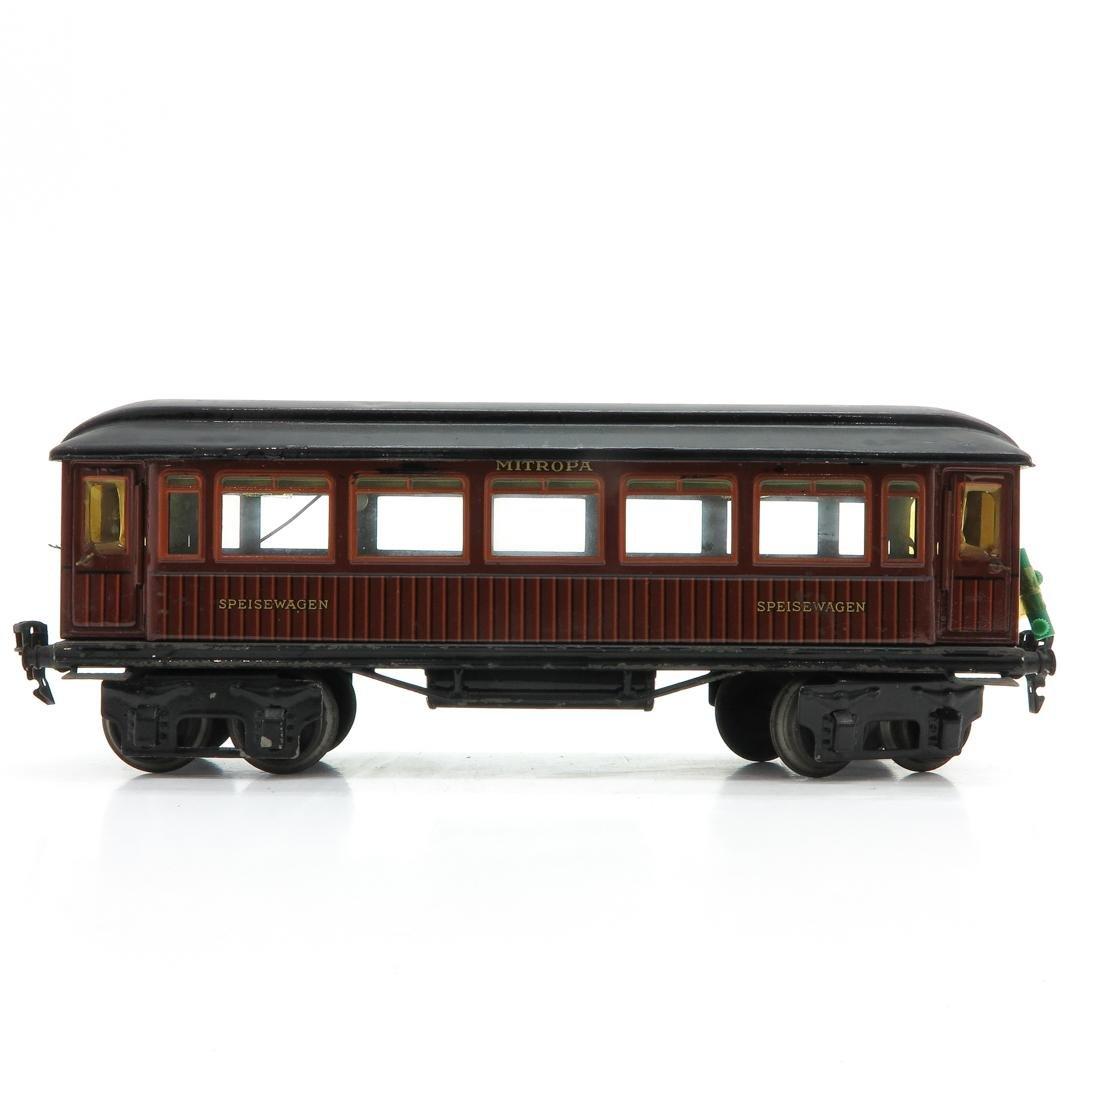 Vintage Marklin Speisewagon Passenger Car - 3